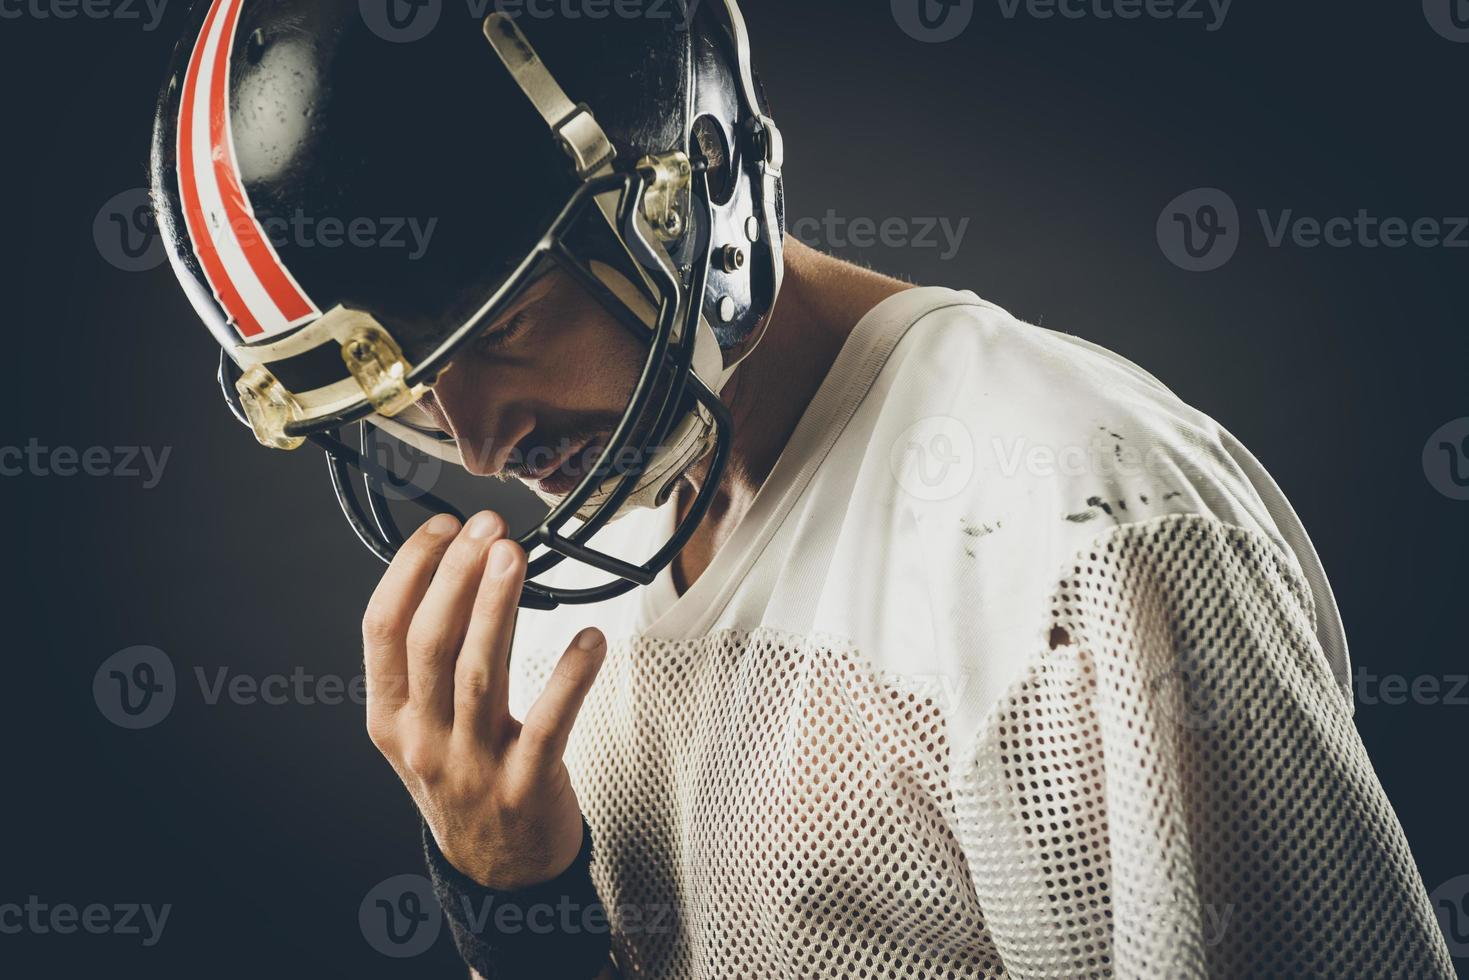 voetbalspeler met helm foto